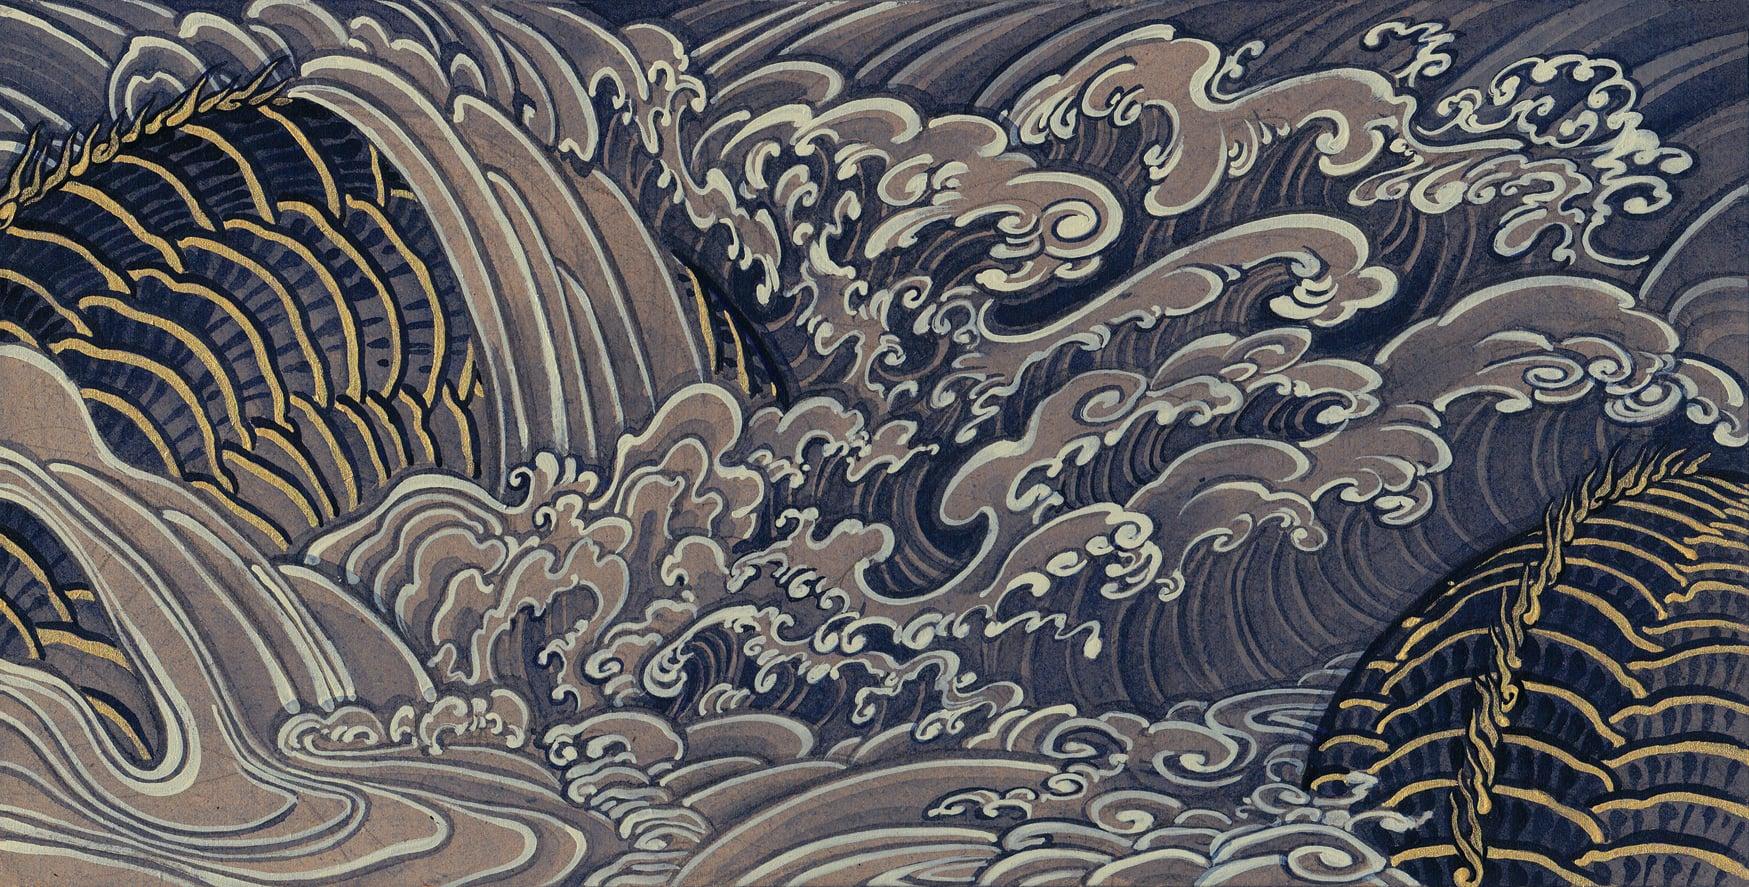 Untitled (hidden dragon) . 2014 - acrylic on wood.